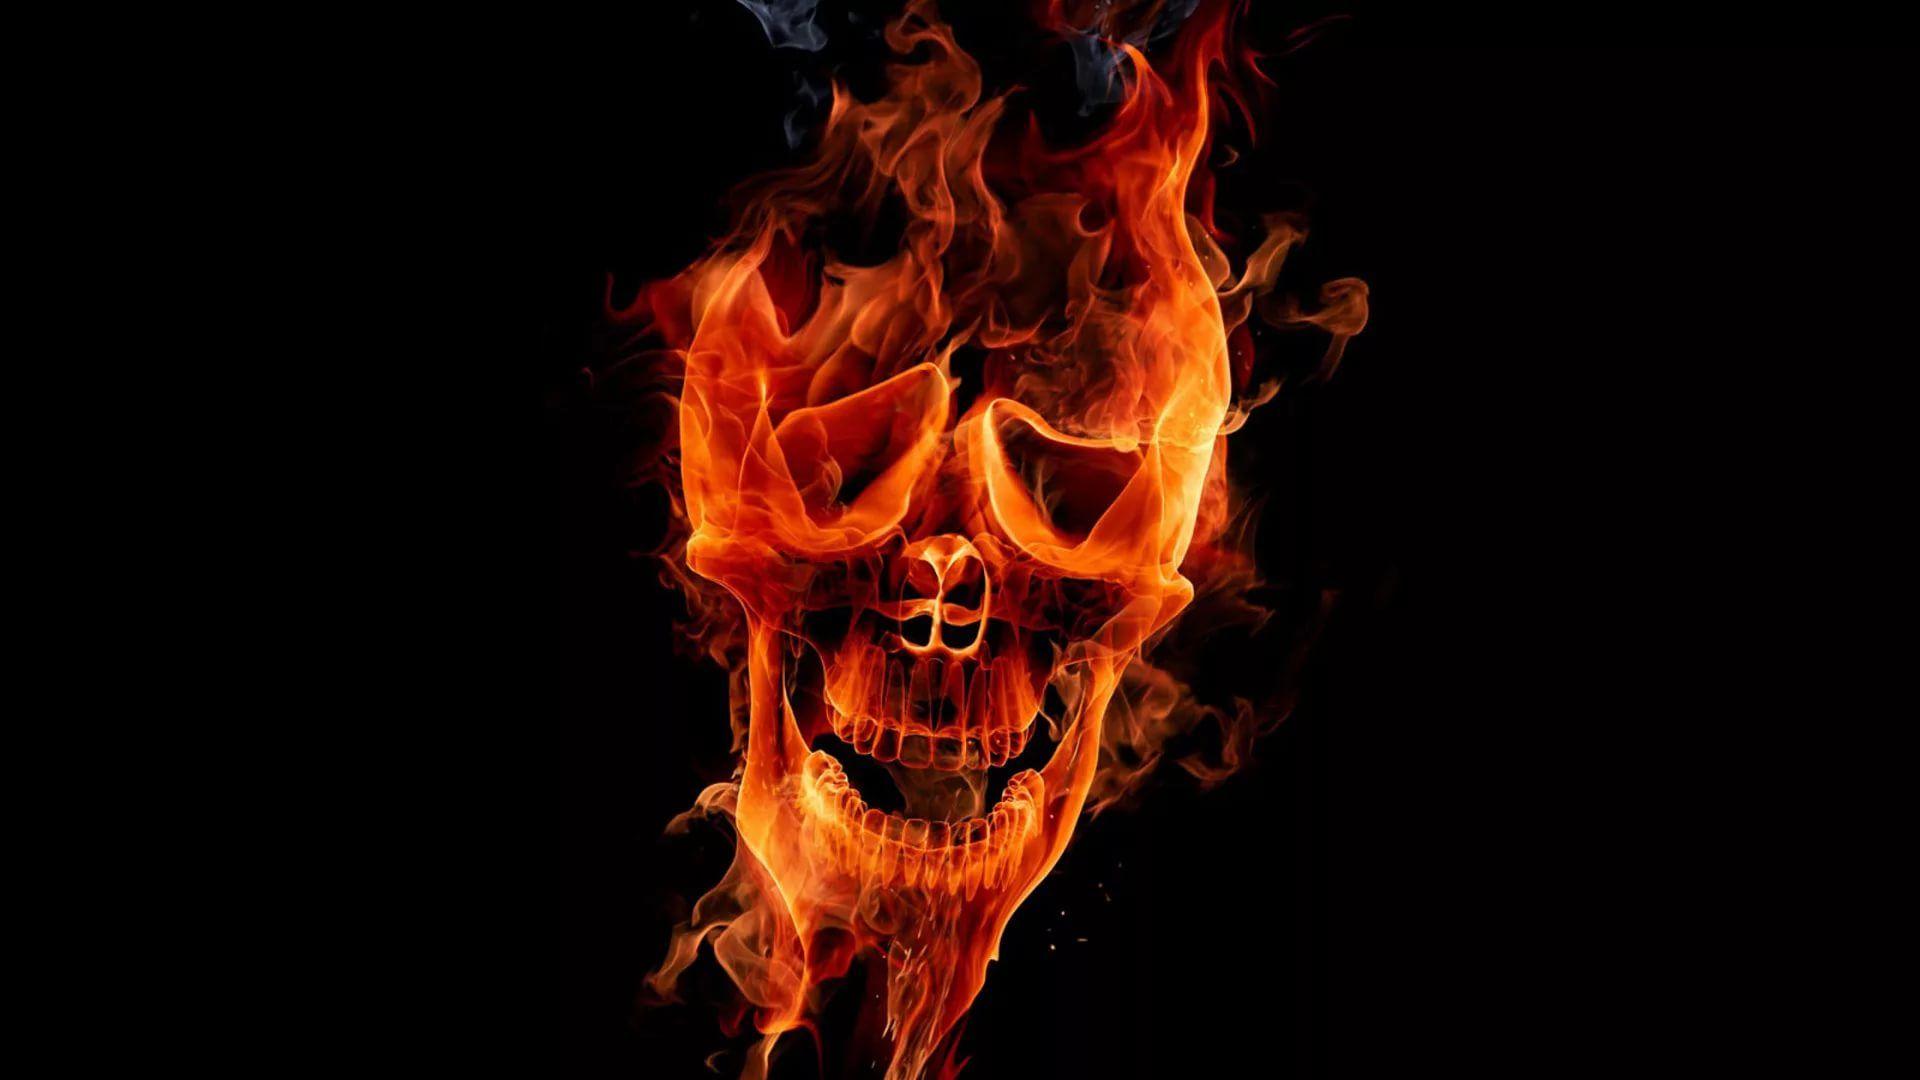 Flaming Skull free hd wallpaper